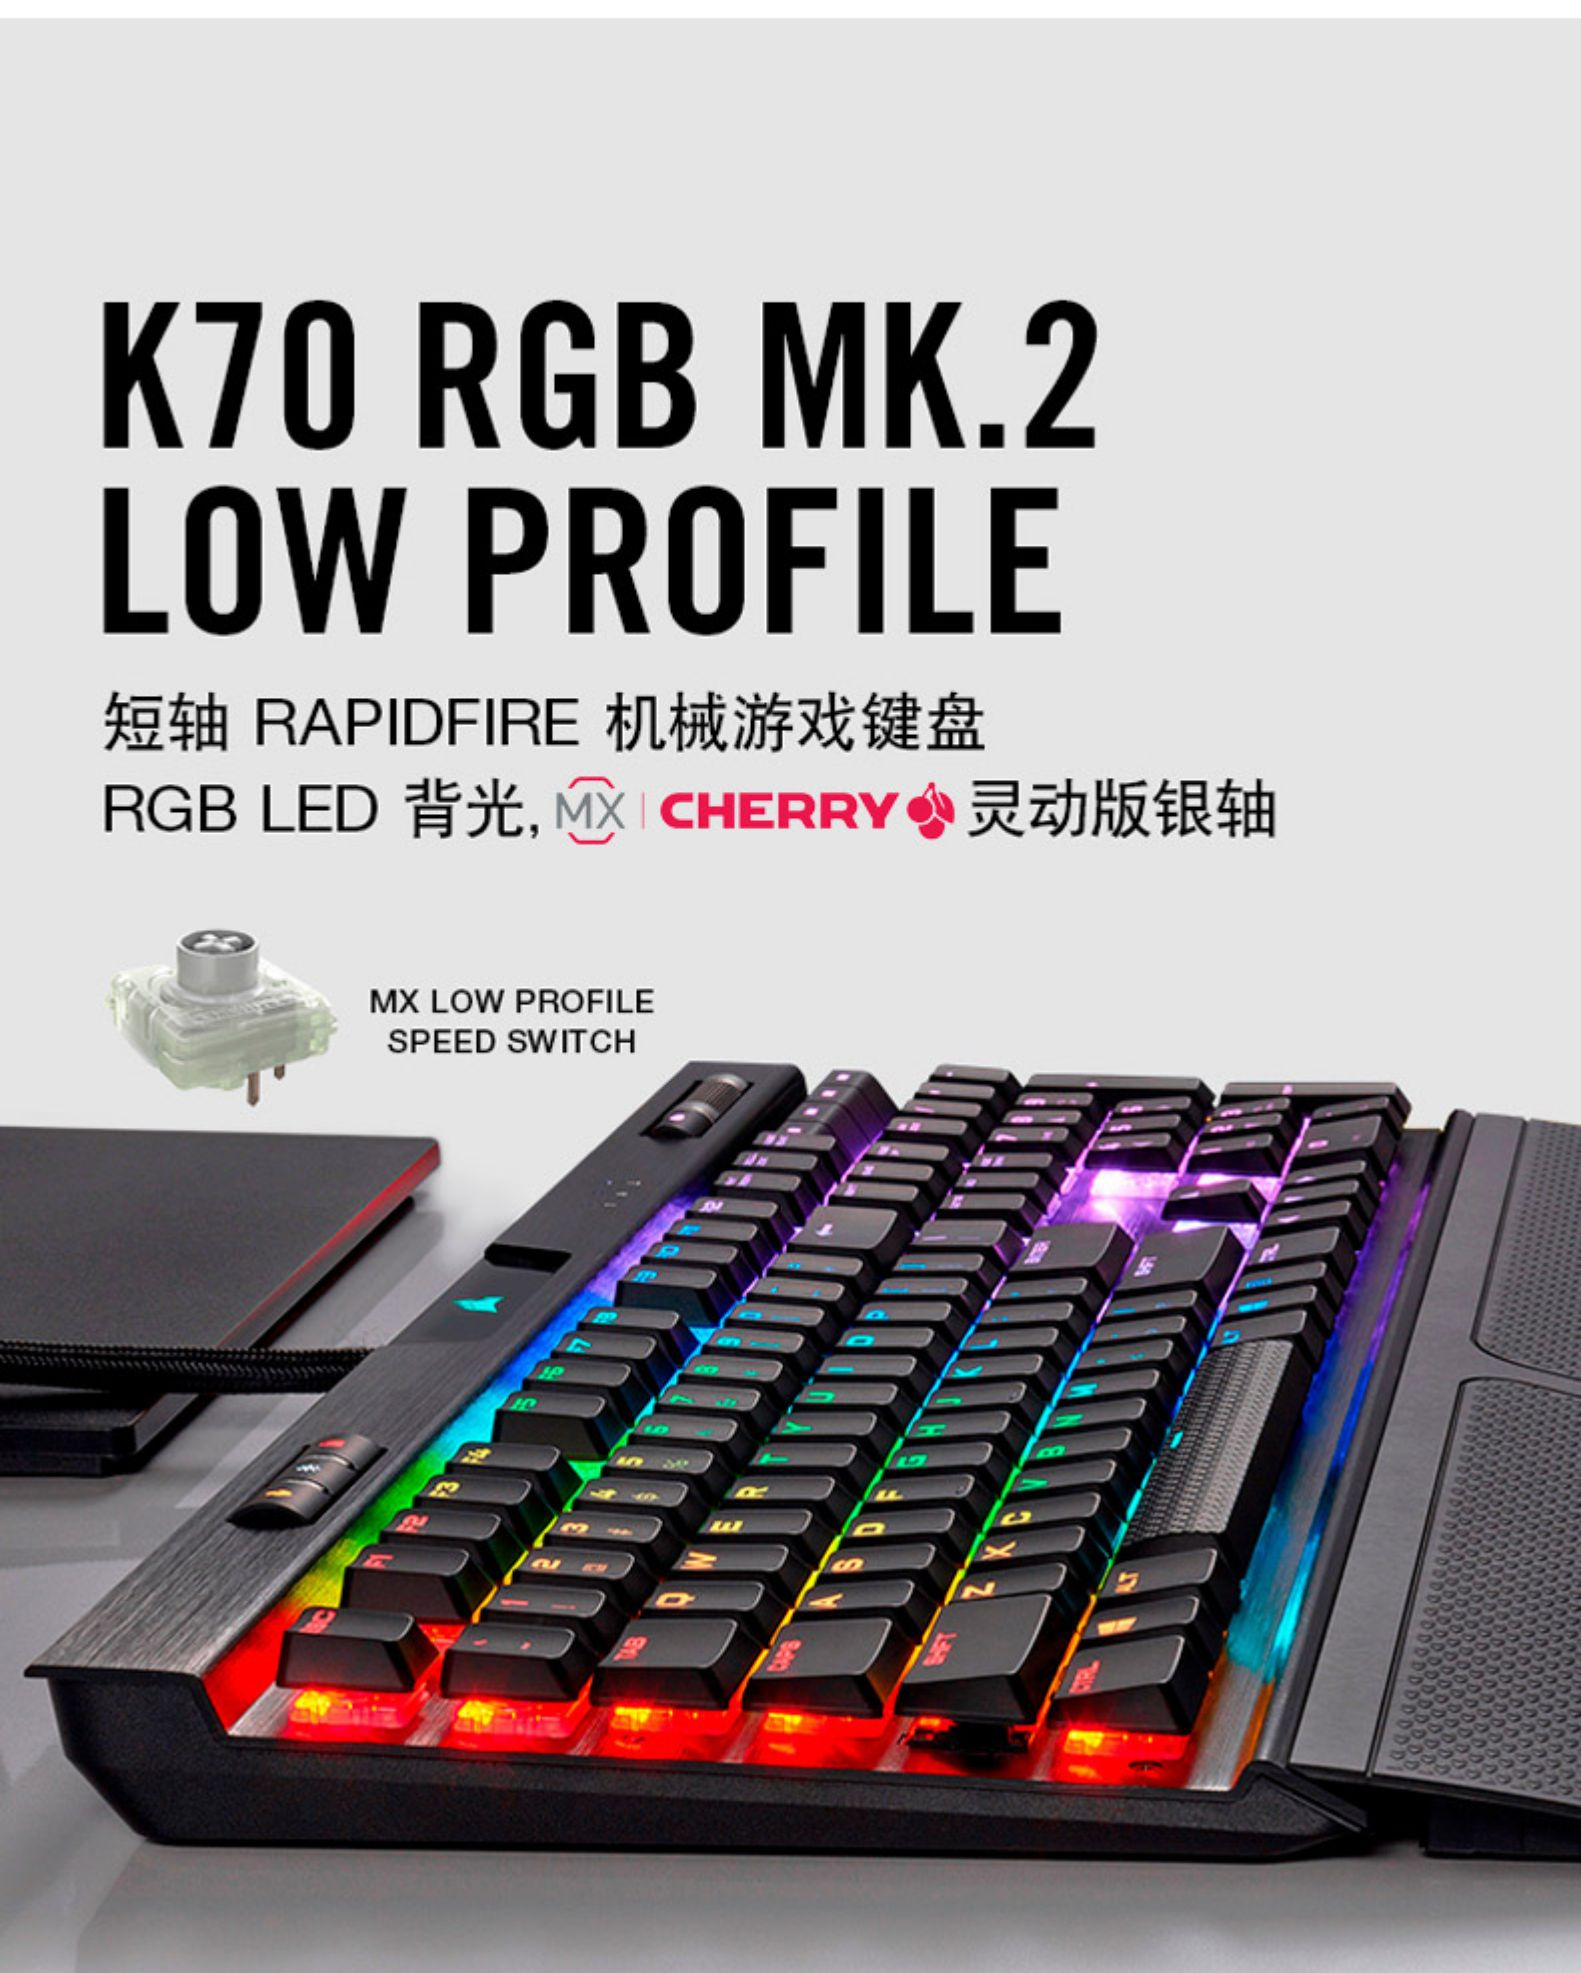 CORSAIR 海盗船 K70 RGB MK.2 SE 机械游戏键盘 灵动版  天猫优惠券折后¥829包邮(¥879-50)